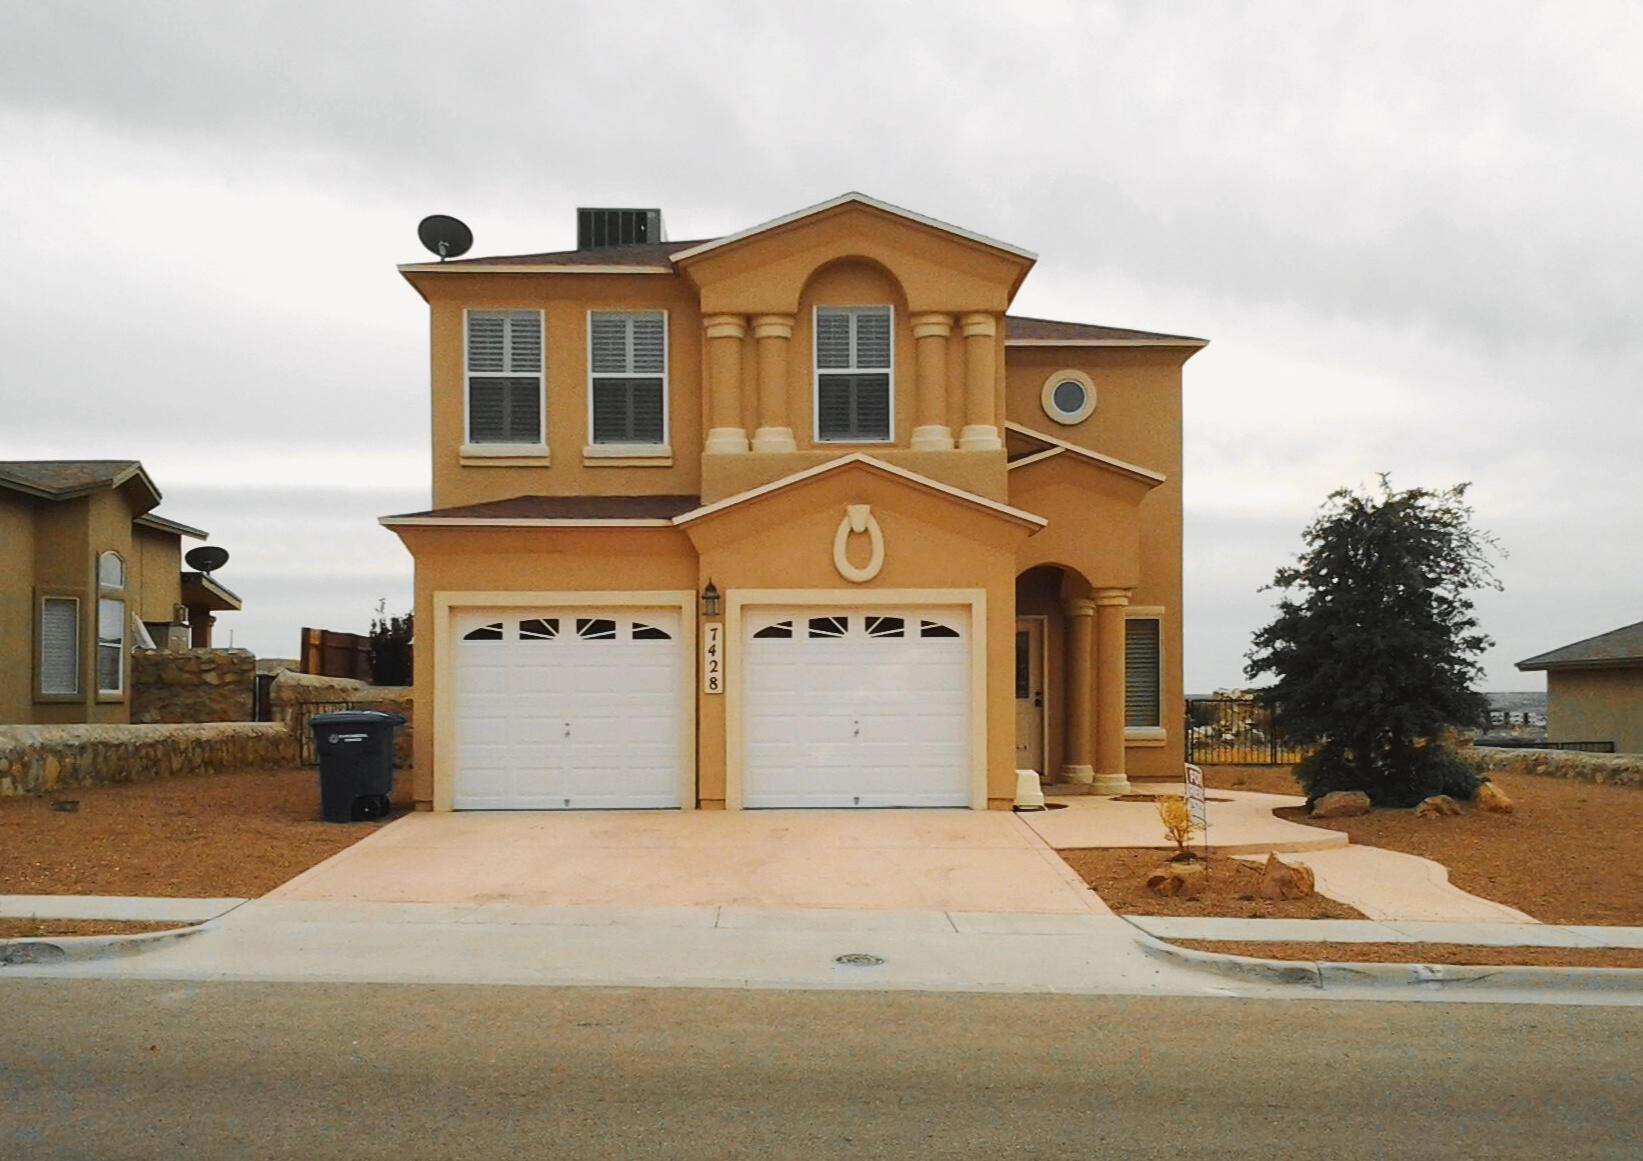 7428 Brays Landing, El Paso, Texas 79911, 4 Bedrooms Bedrooms, ,3 BathroomsBathrooms,Residential,For sale,Brays Landing,817143